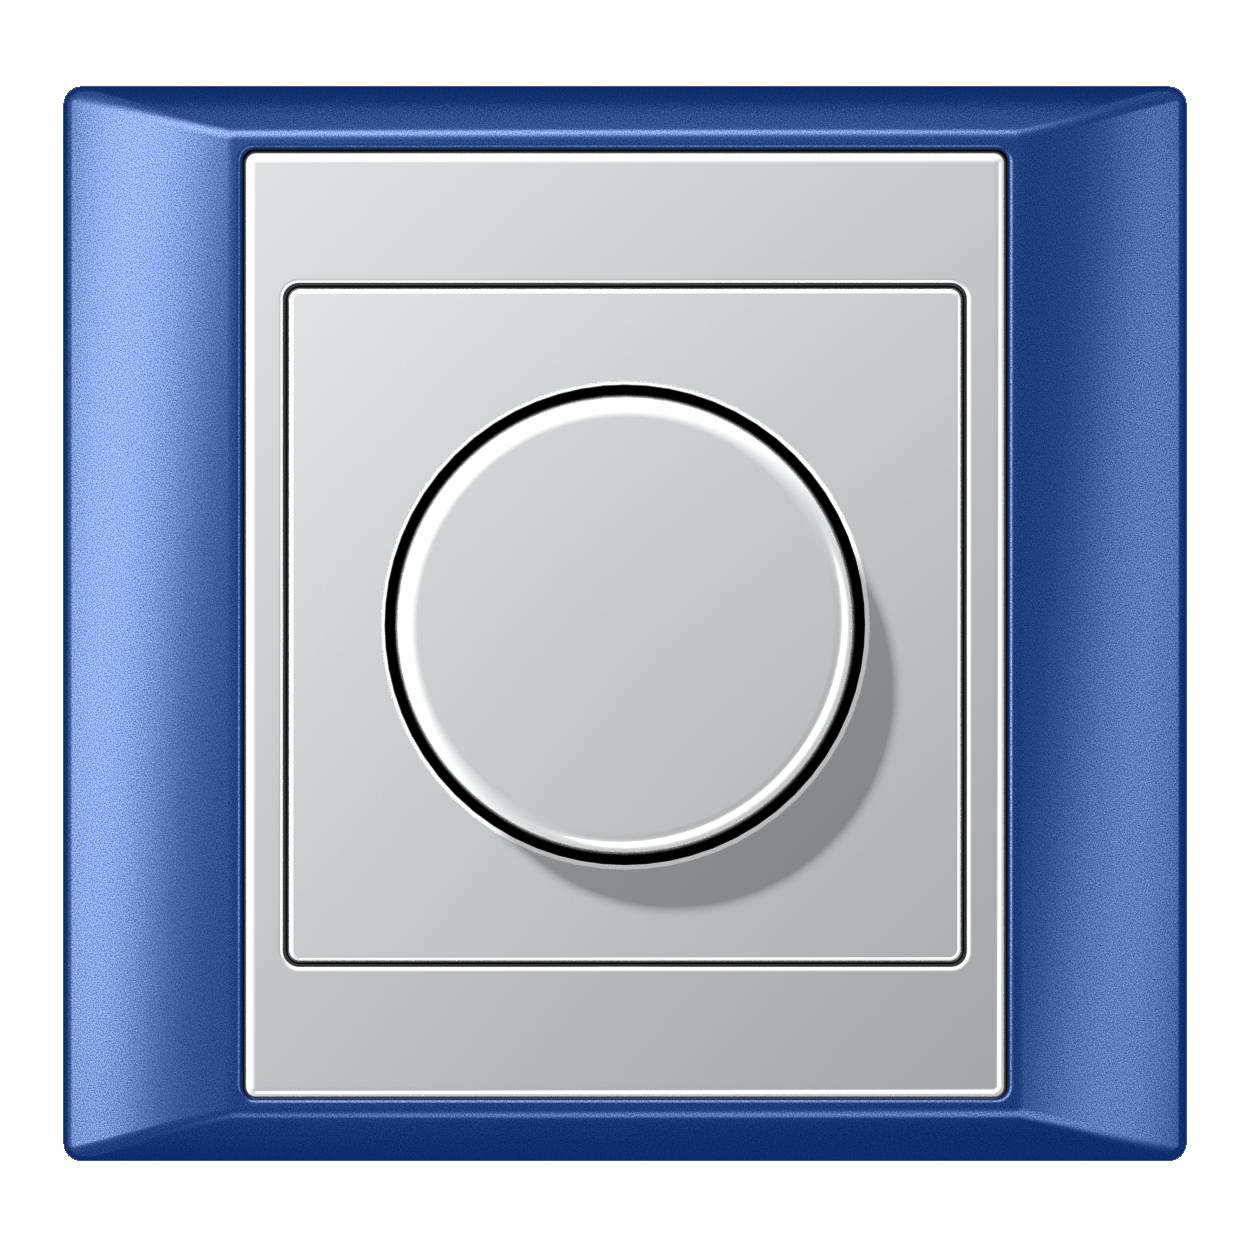 JUNG_Aplus_blue_aluminium_dimmer